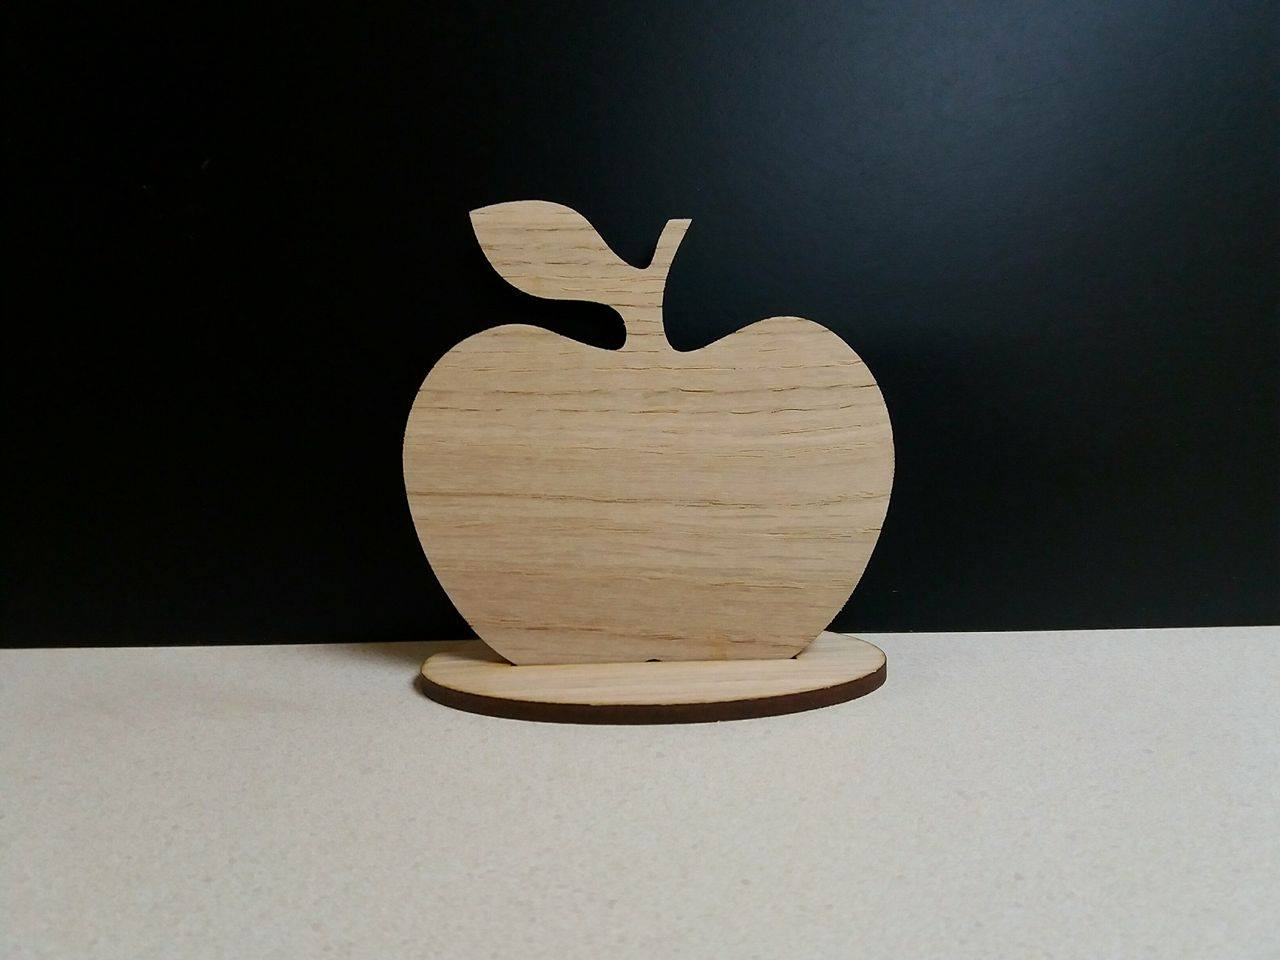 Woodform crafts creative mdf oak veneer craft designs for Wood veneer craft projects